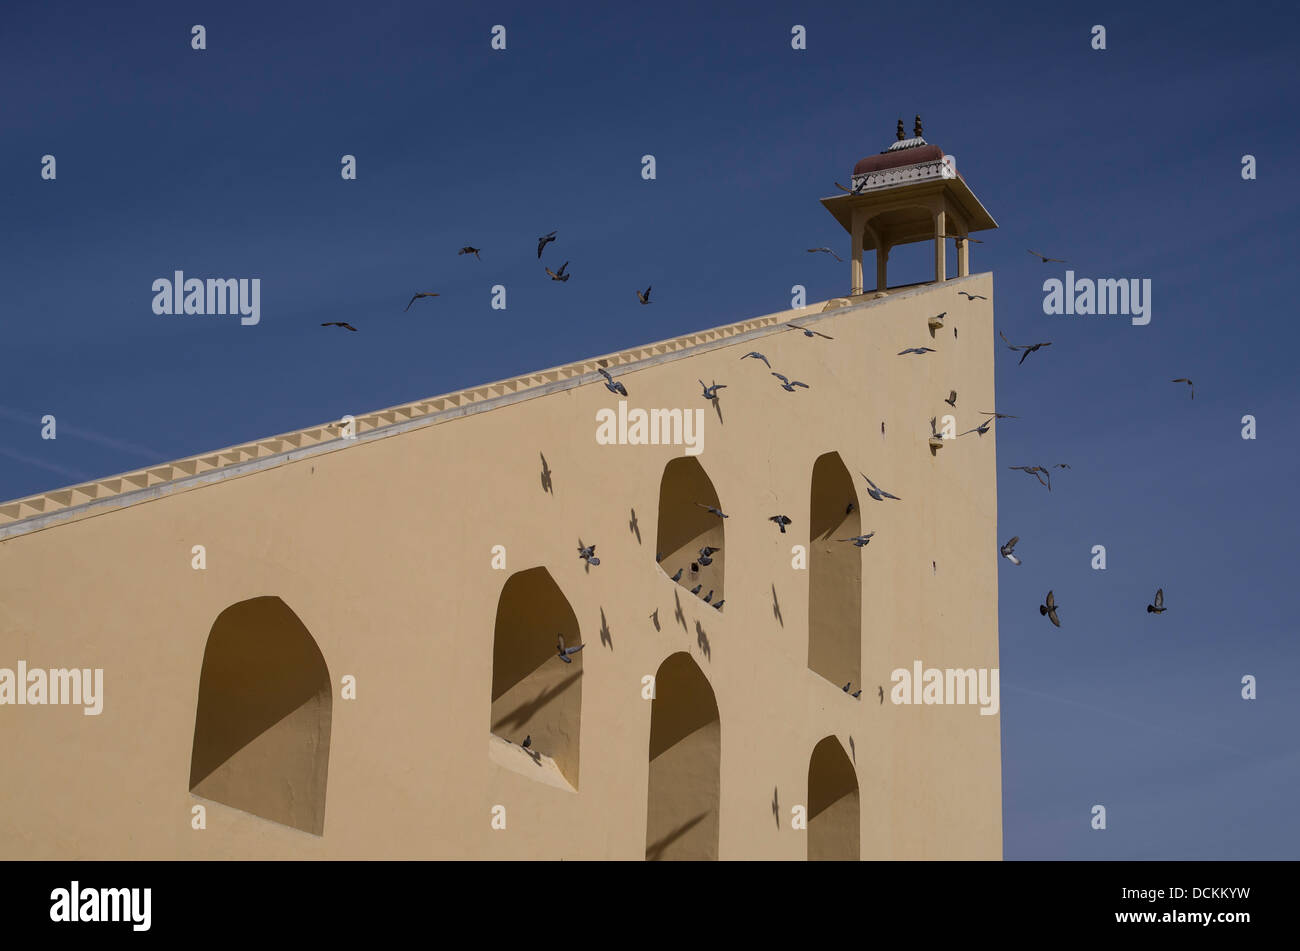 Samrat Yantra 27m meridiana un dispositivo astronomico a Jantar Mantar Observatory - Jaipur, Rajasthan, India Immagini Stock